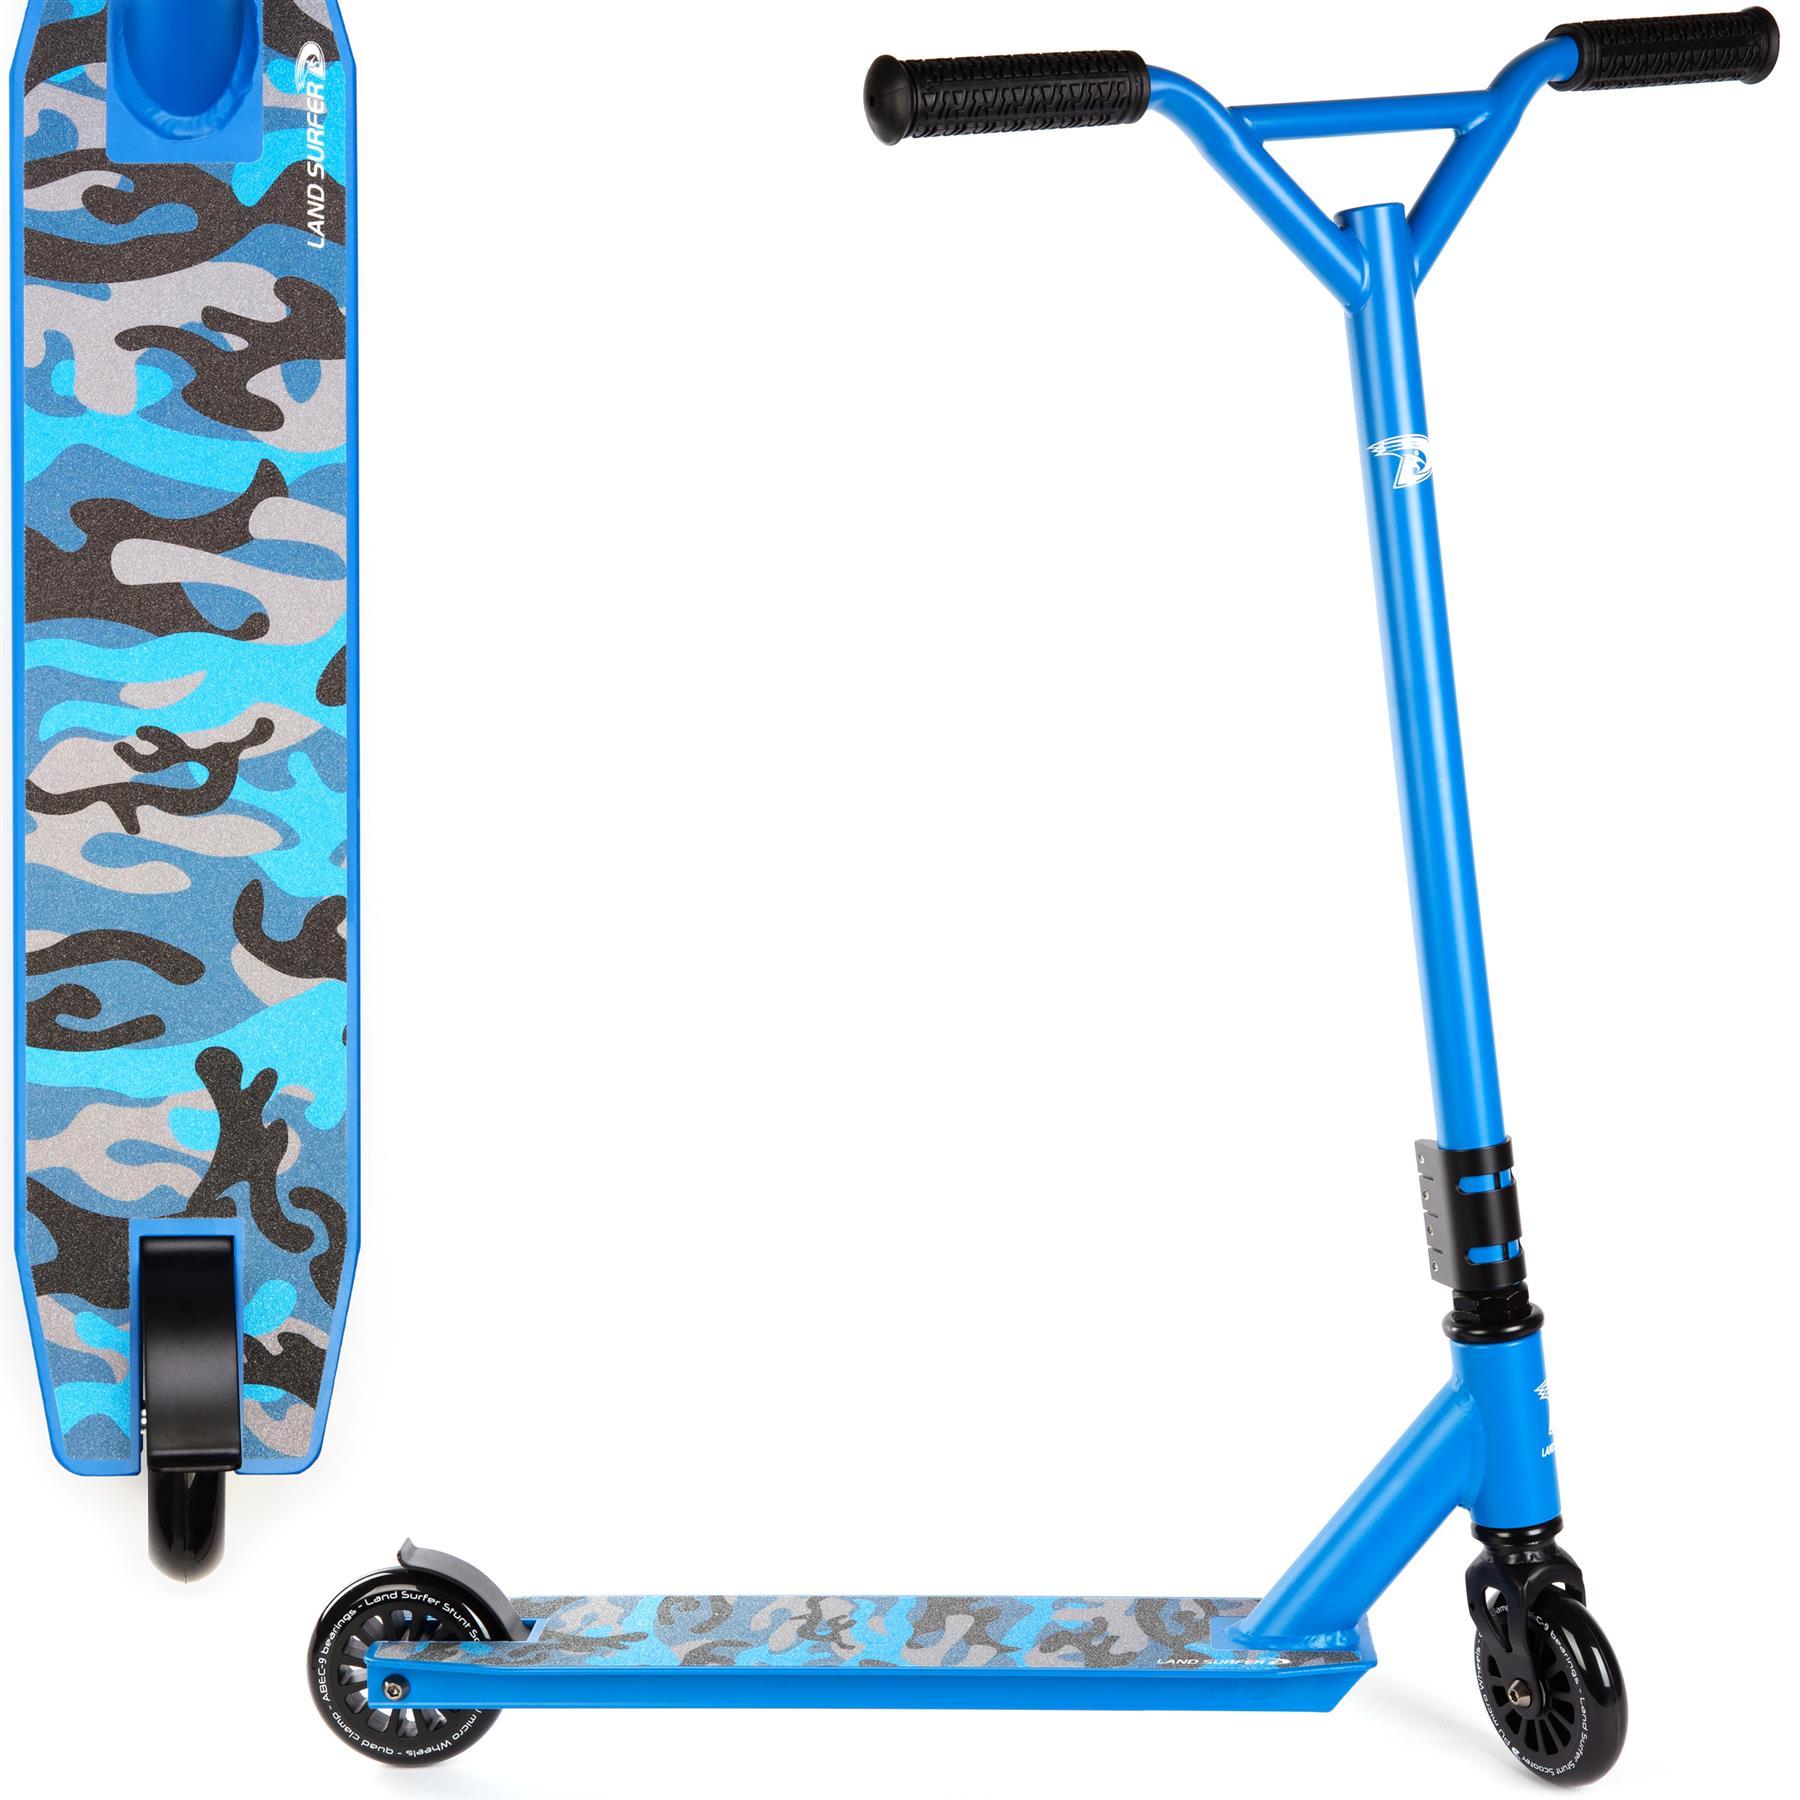 Land Surfer Stunt Scooter   Blue Camo